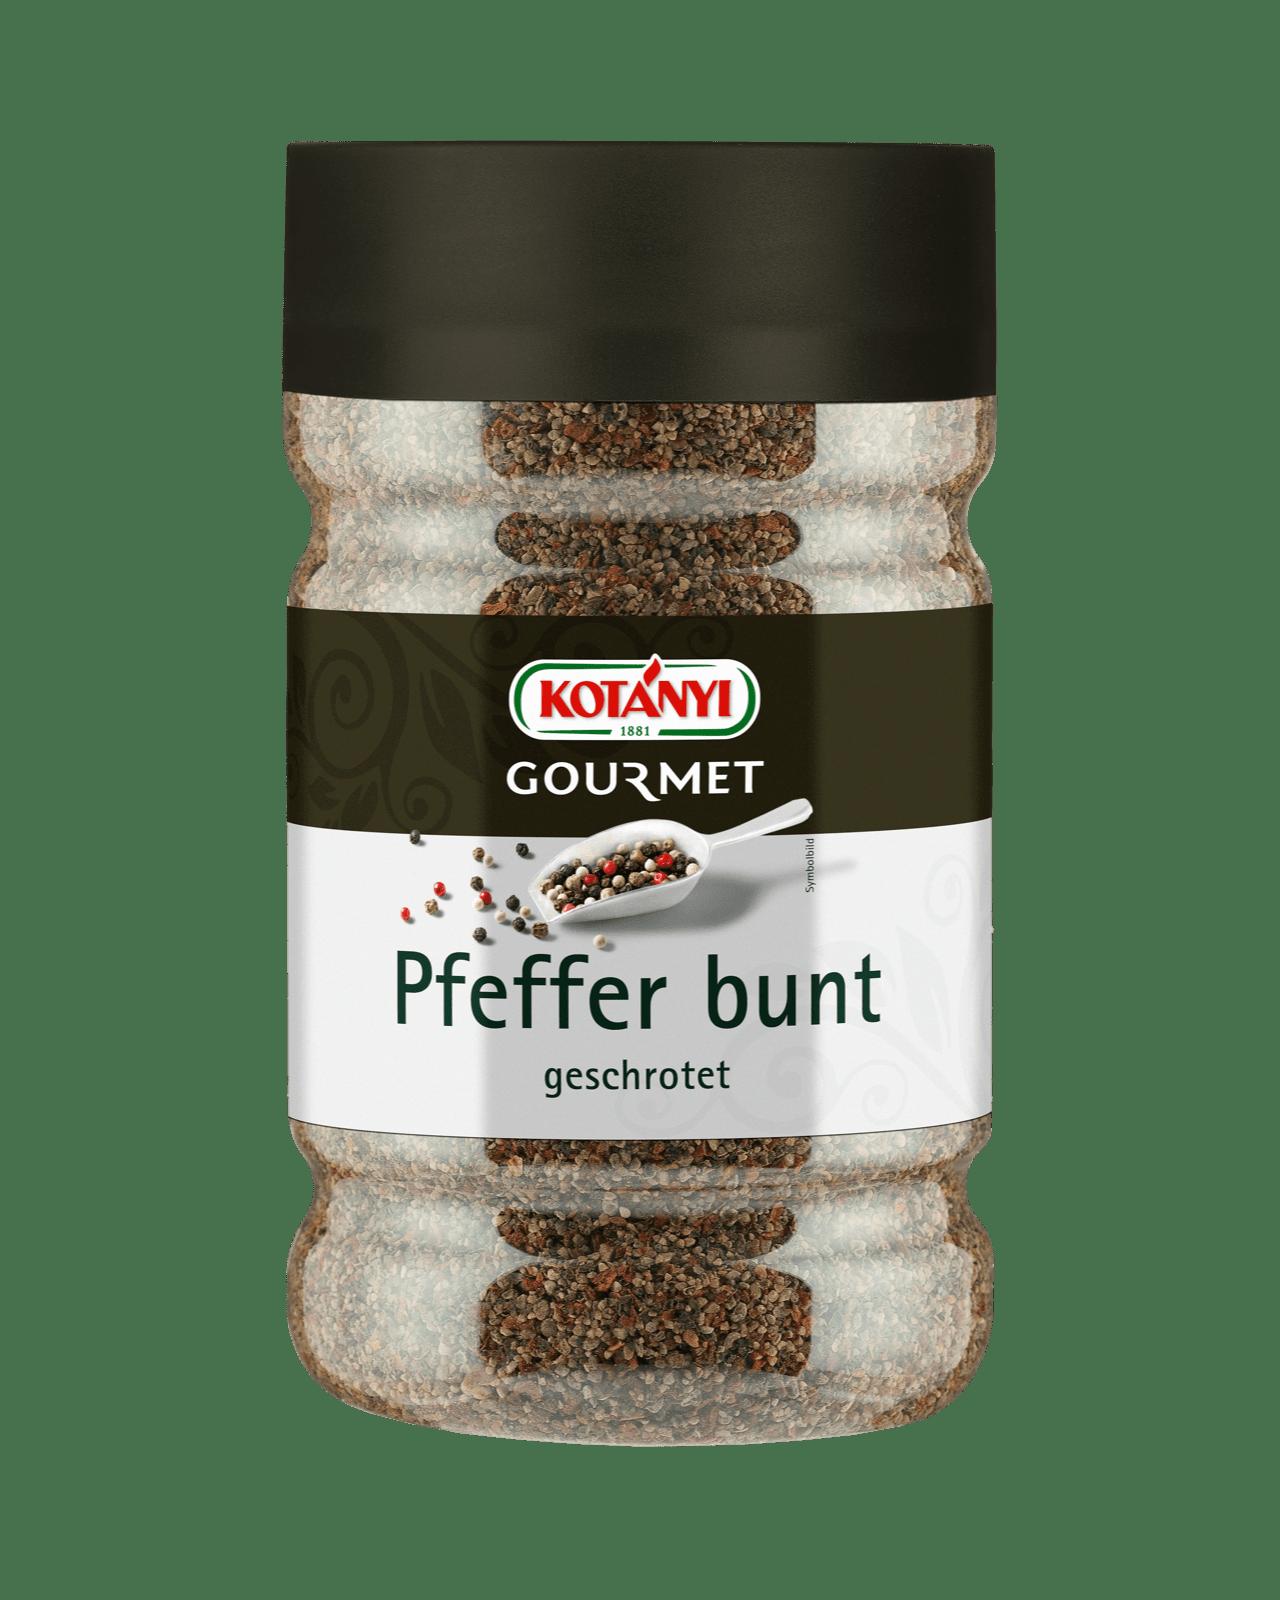 Kotányi Gourmet Pfeffer bunt geschrotet in der Dose